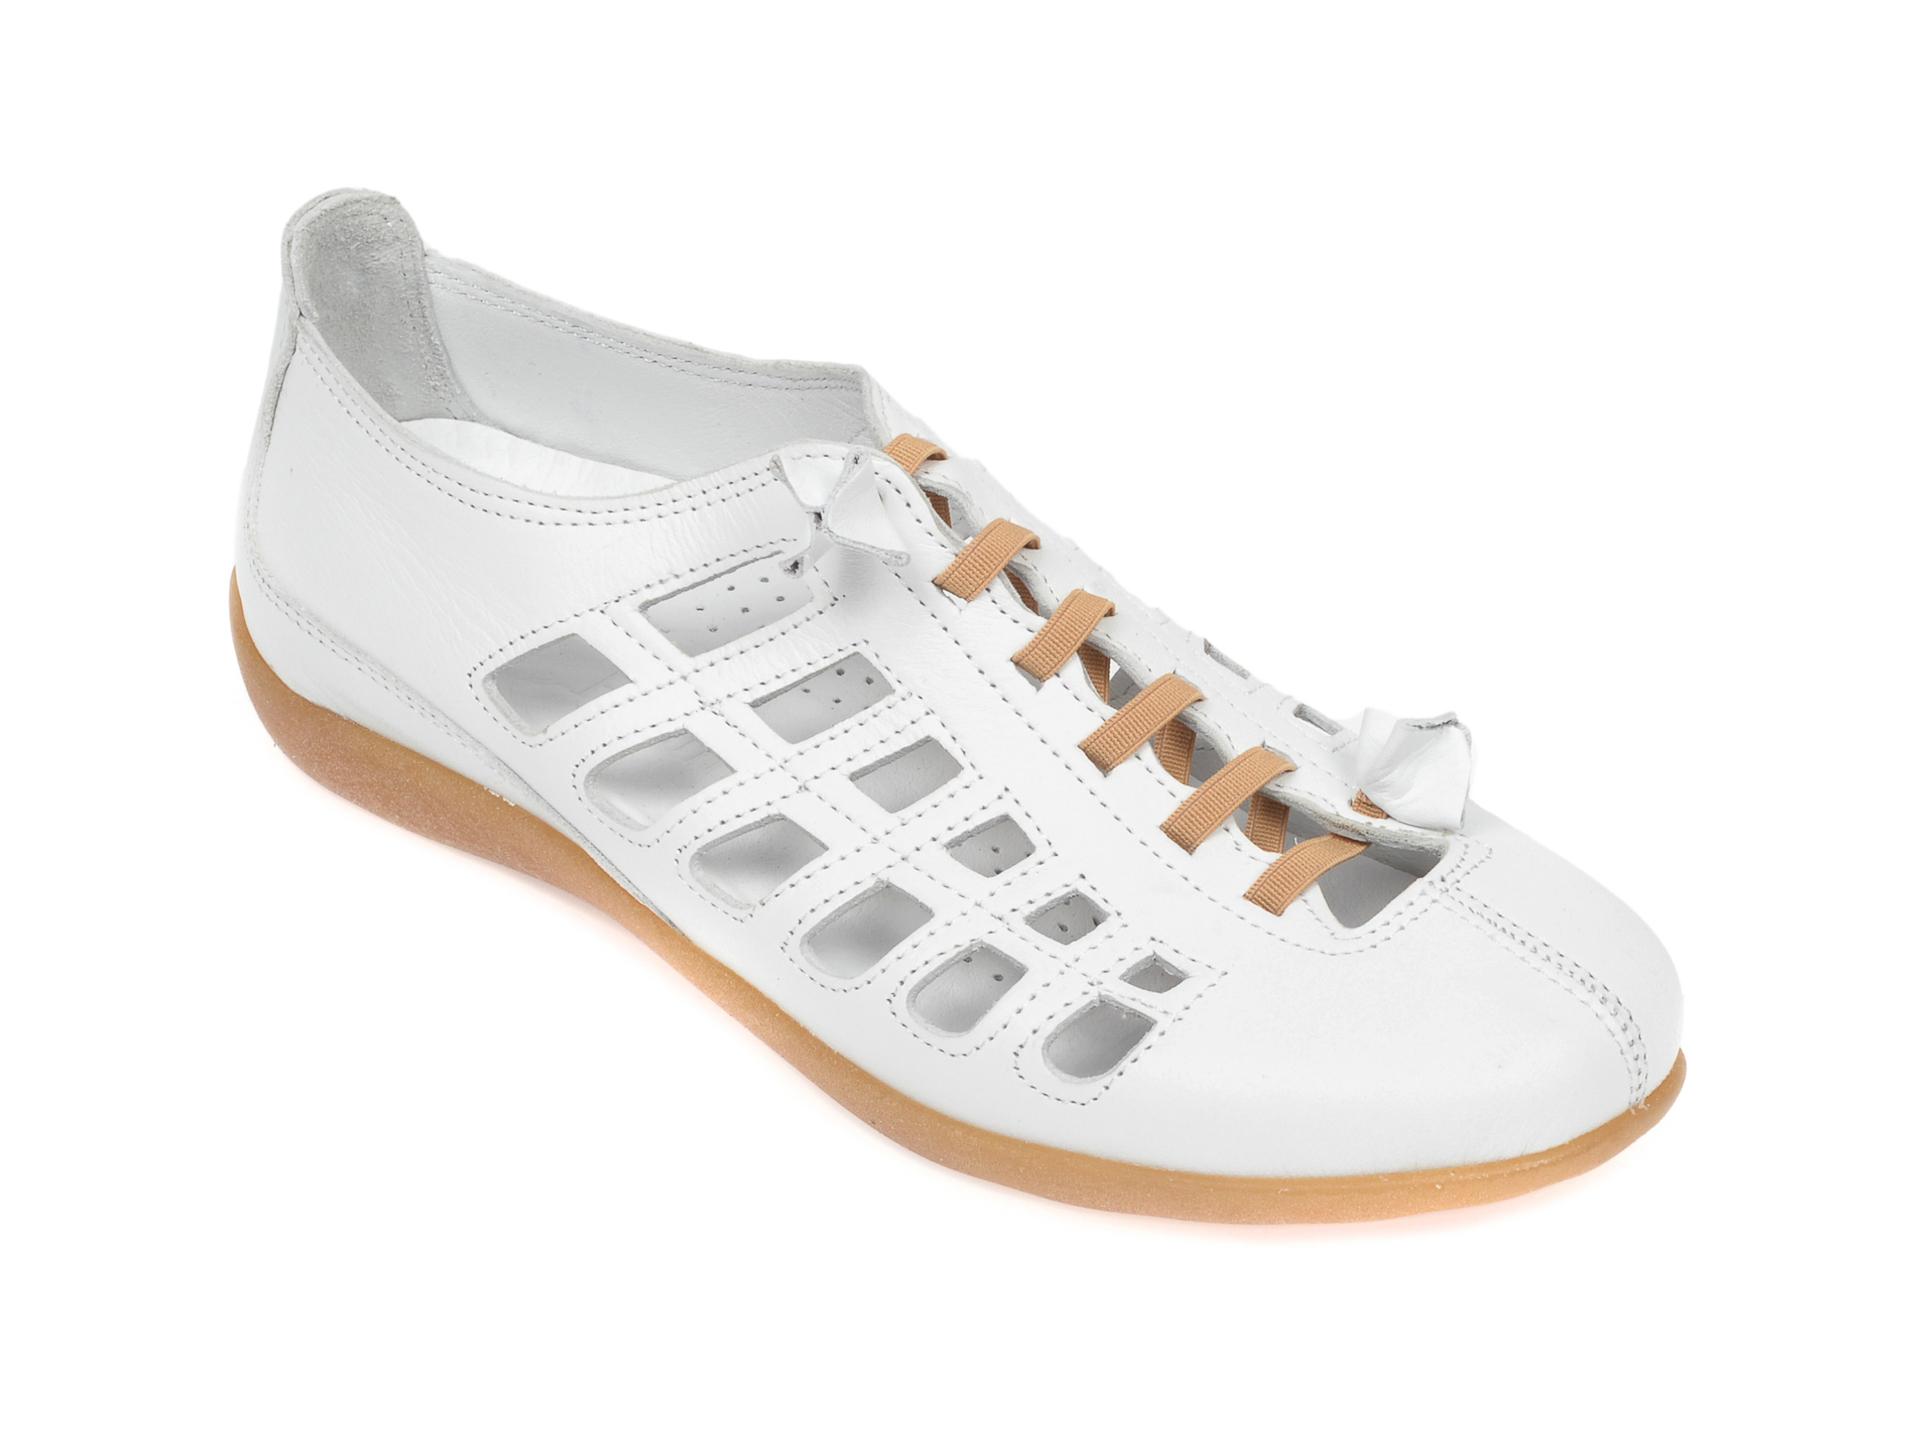 Pantofi FLAVIA PASSINI albi, 305, din piele naturala imagine